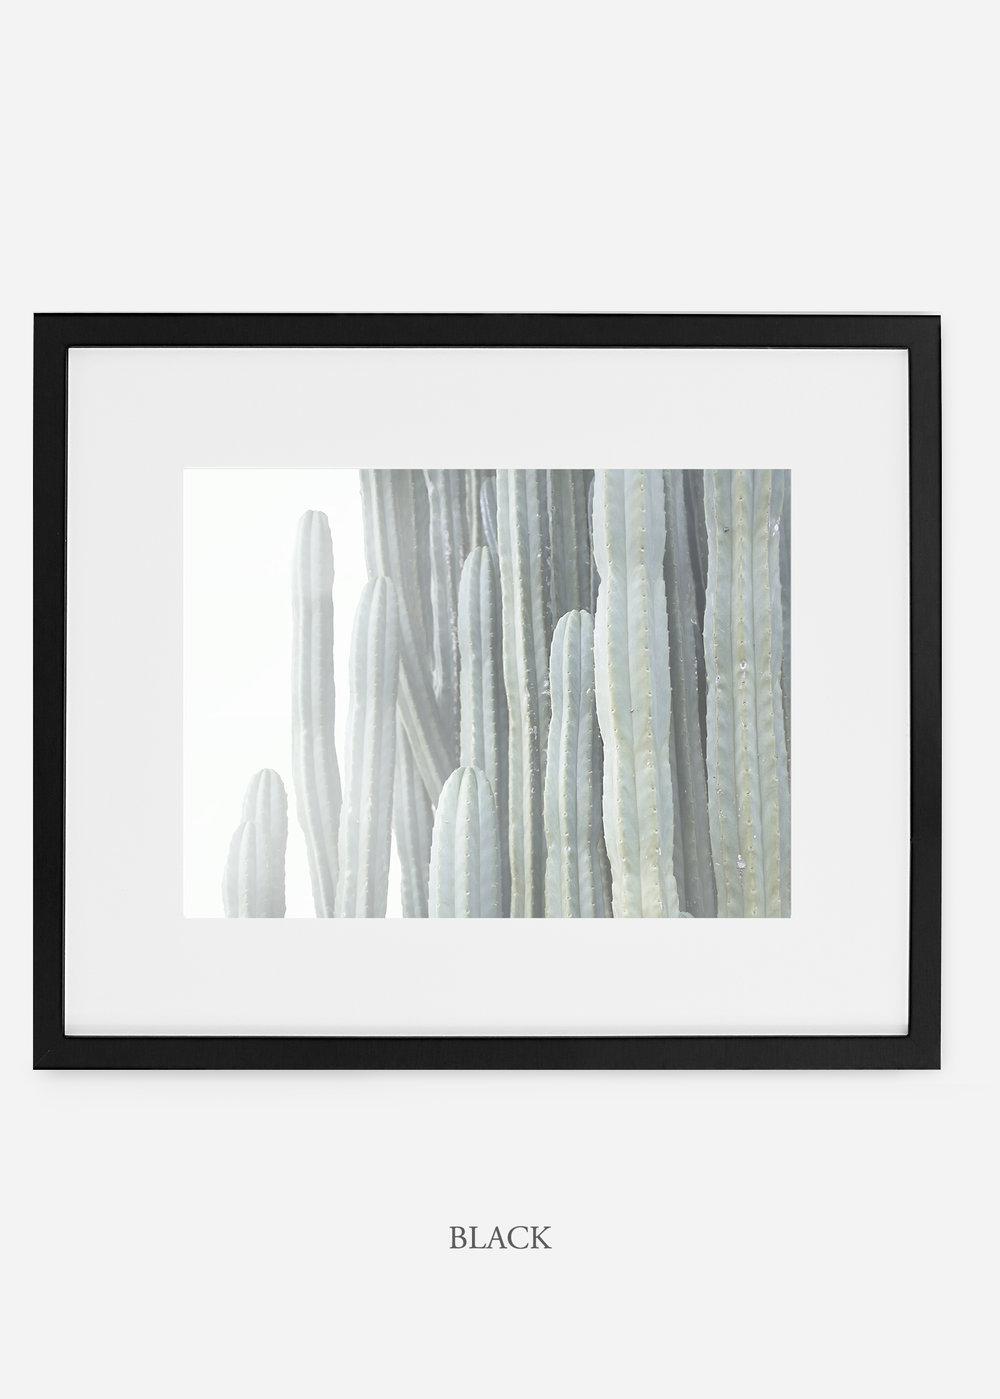 WilderCalifornia_blackframe__Cactus_Art_Photography_interiordesign_white_bohemian_neutral_photography_photo.jpg